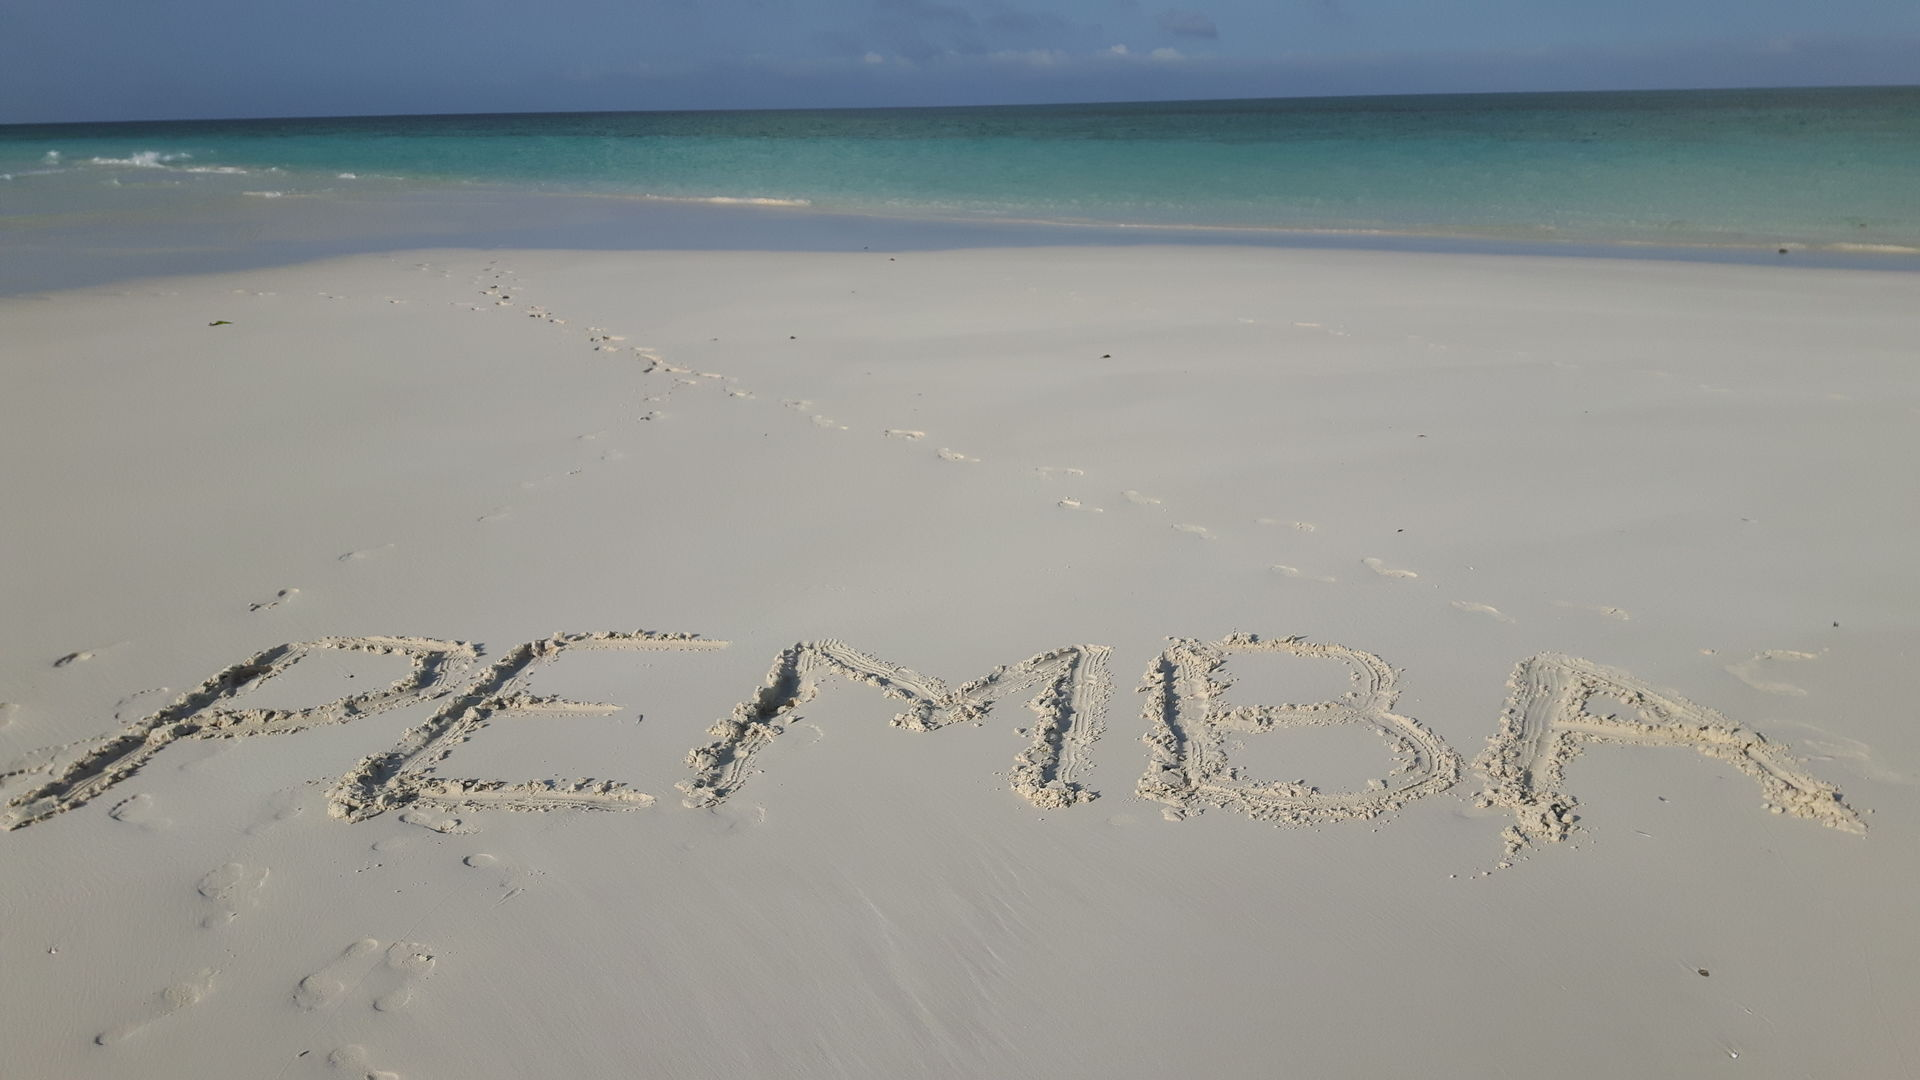 Pemba vakantie - Reizen naar Pemba Afrika | Matoke Tours